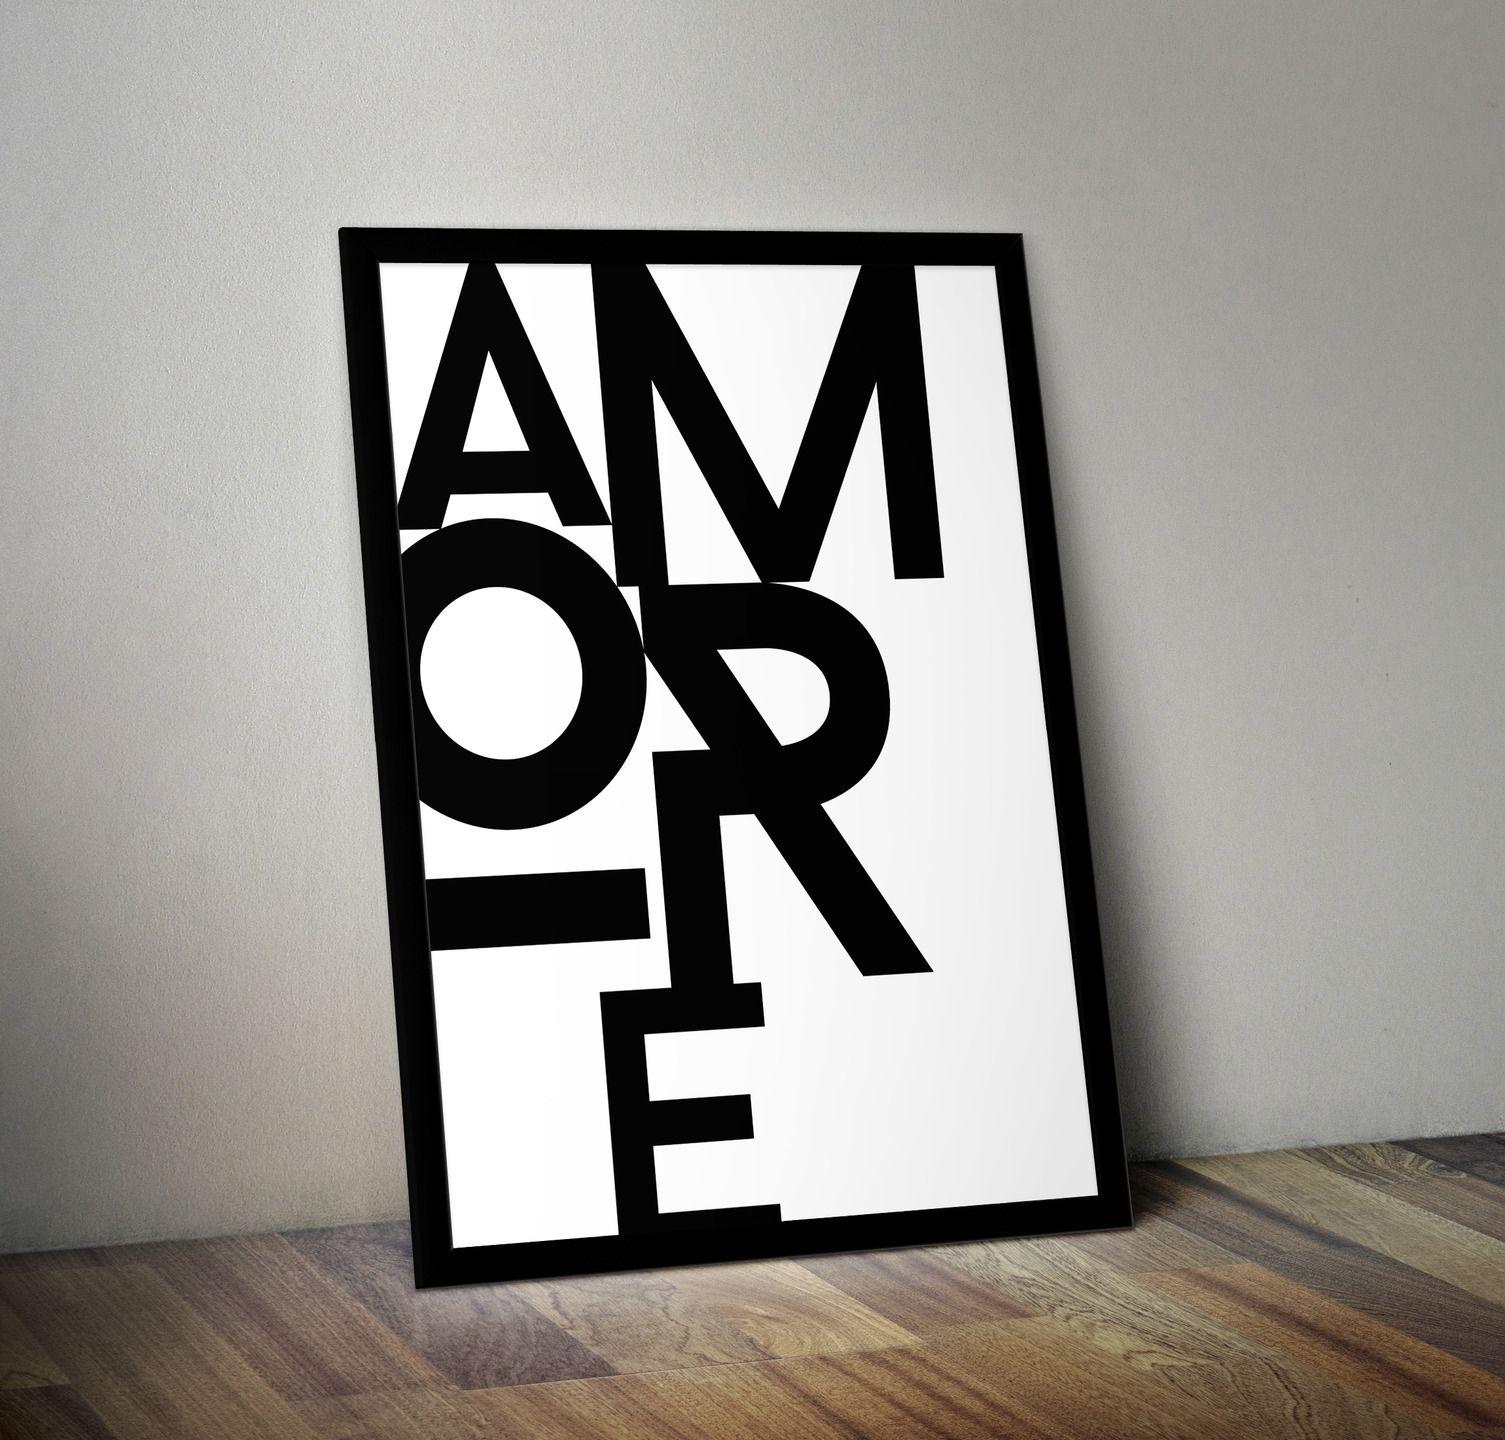 affiche typographie amore texte t l charger affiches illustrations posters par rgb. Black Bedroom Furniture Sets. Home Design Ideas